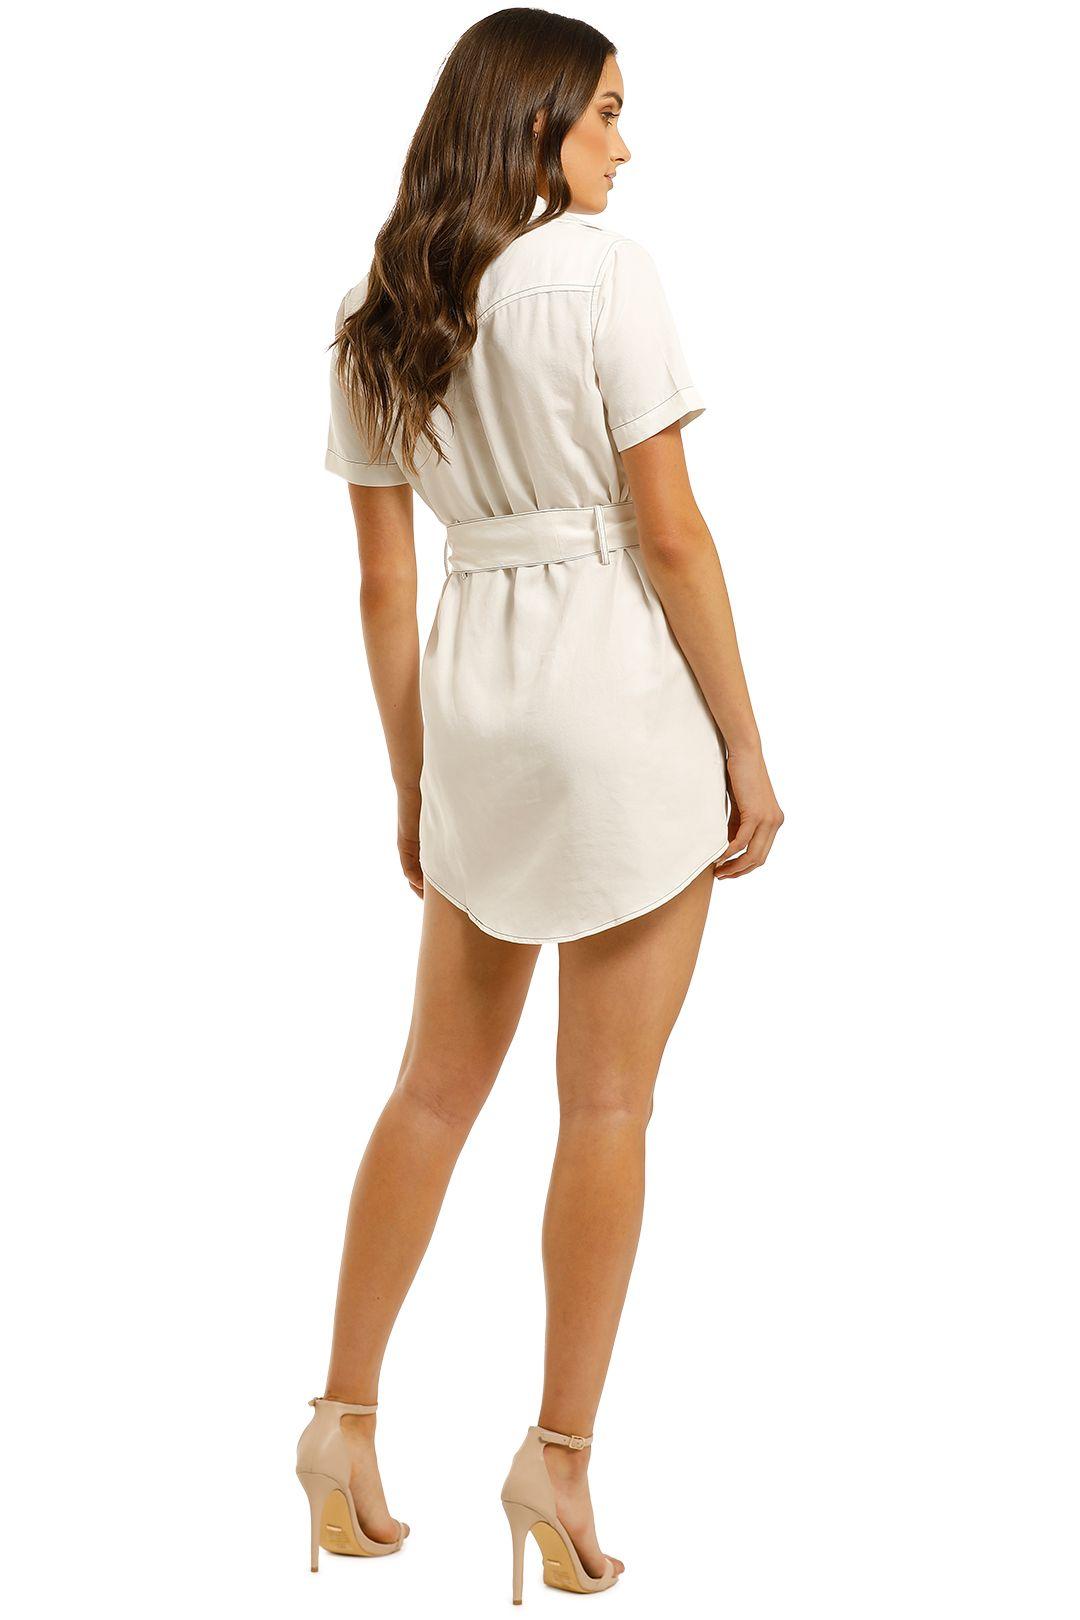 Third-Form-Western-Shirt-Dress-Off-White-Back